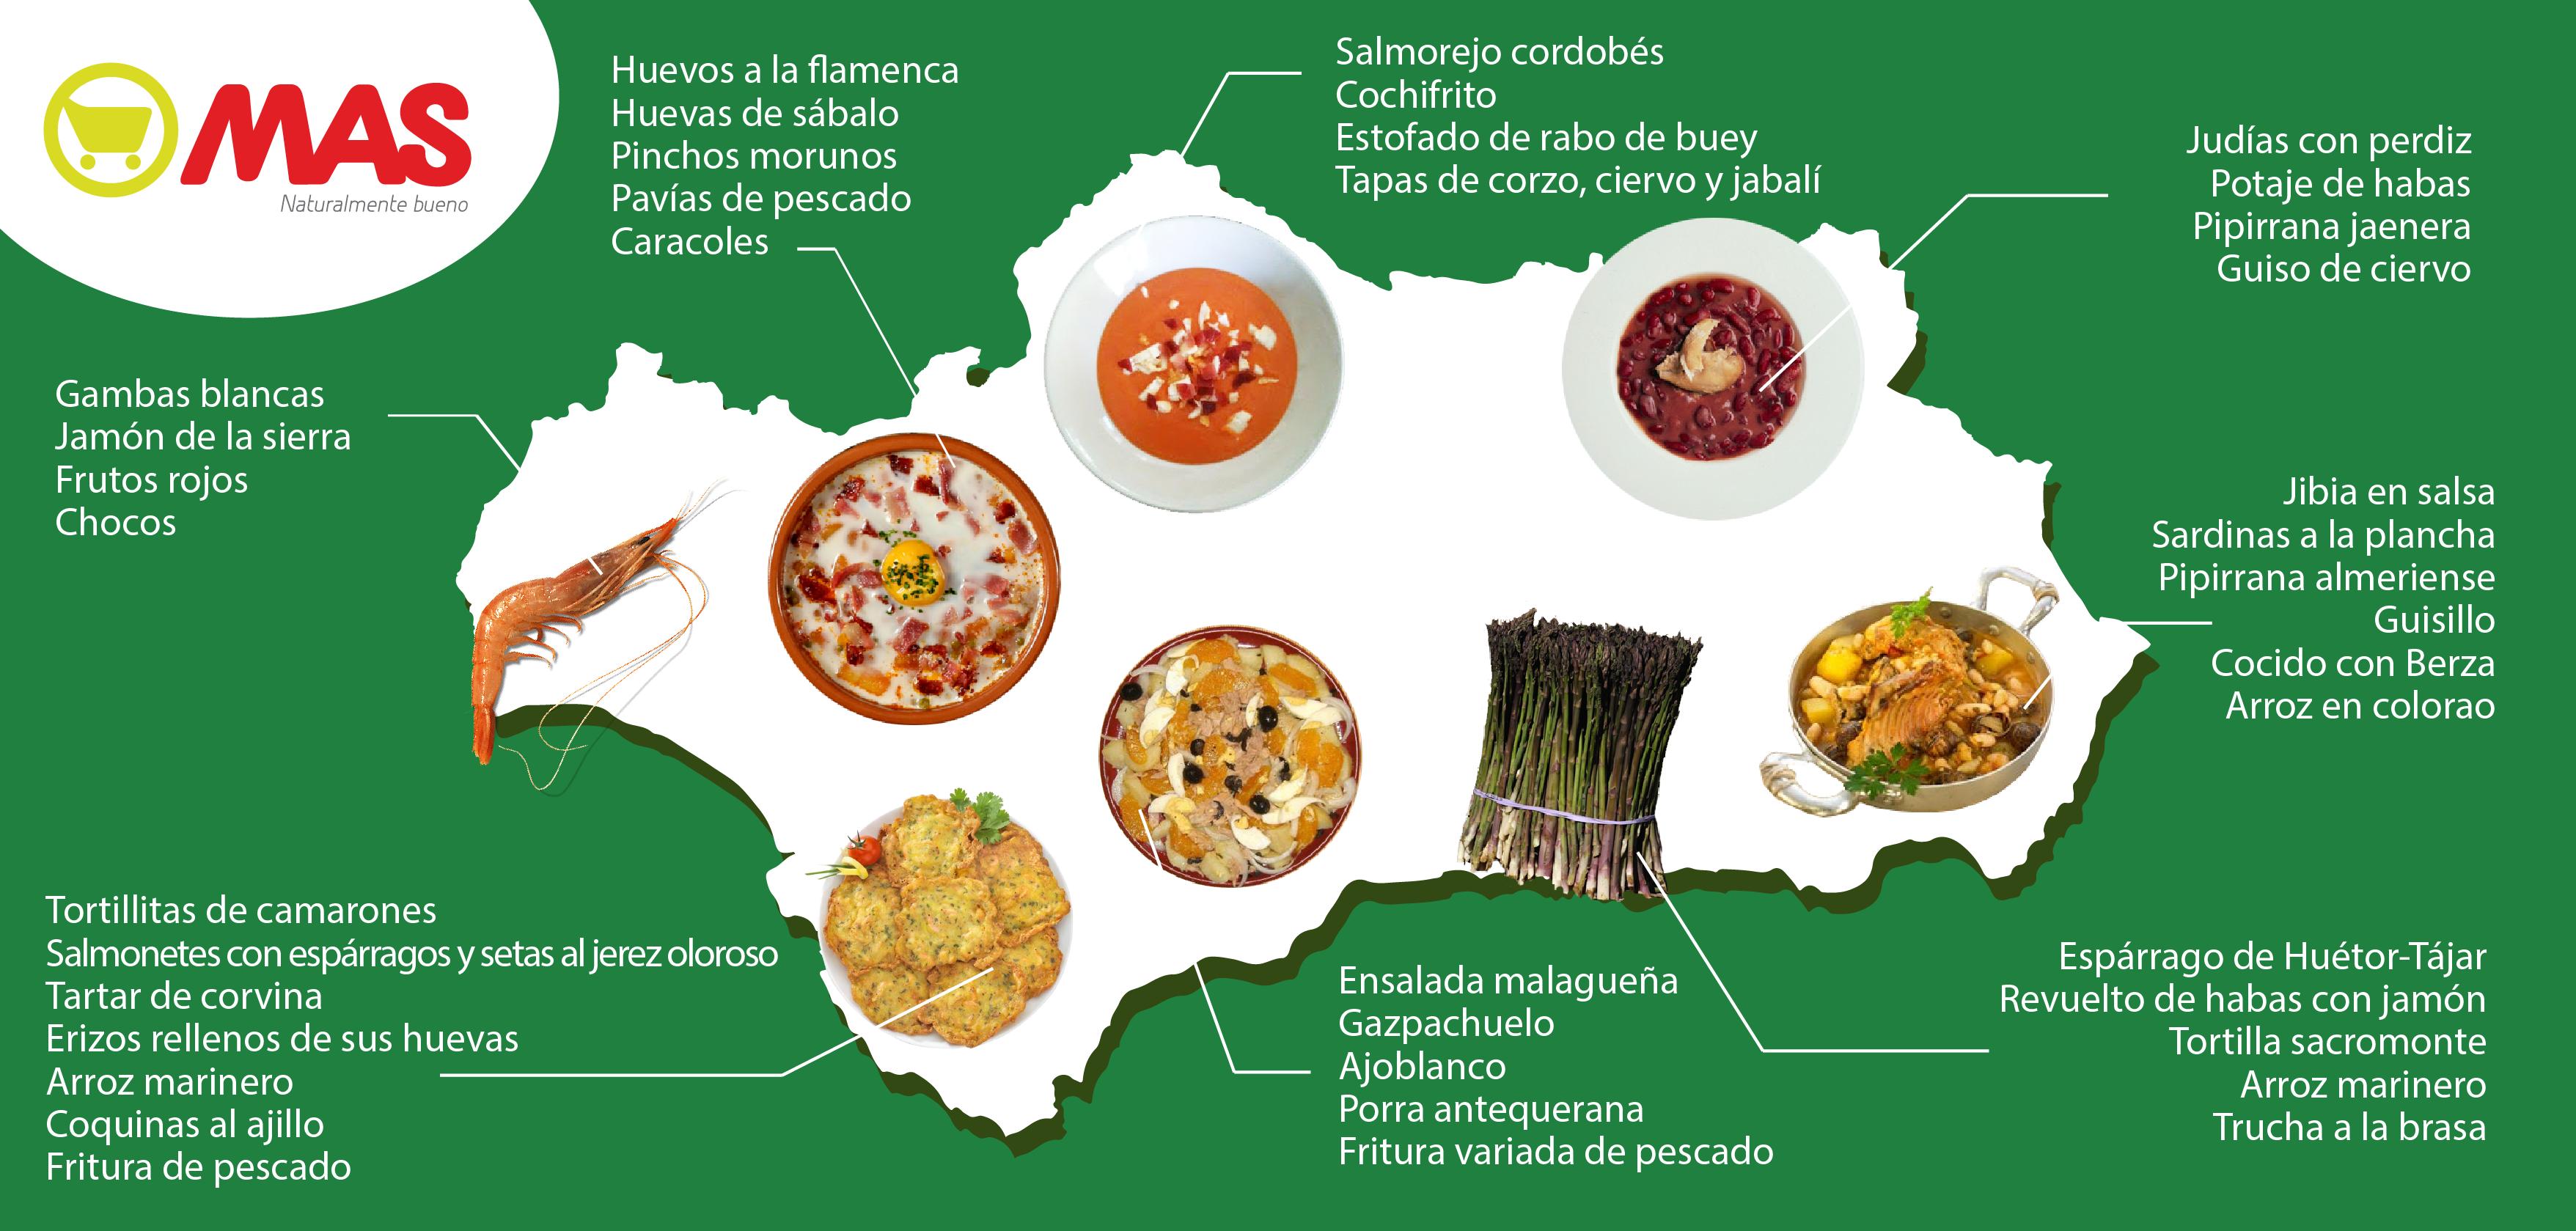 Platos Tipicos De Las Provincias Andaluzas Diaandalucia